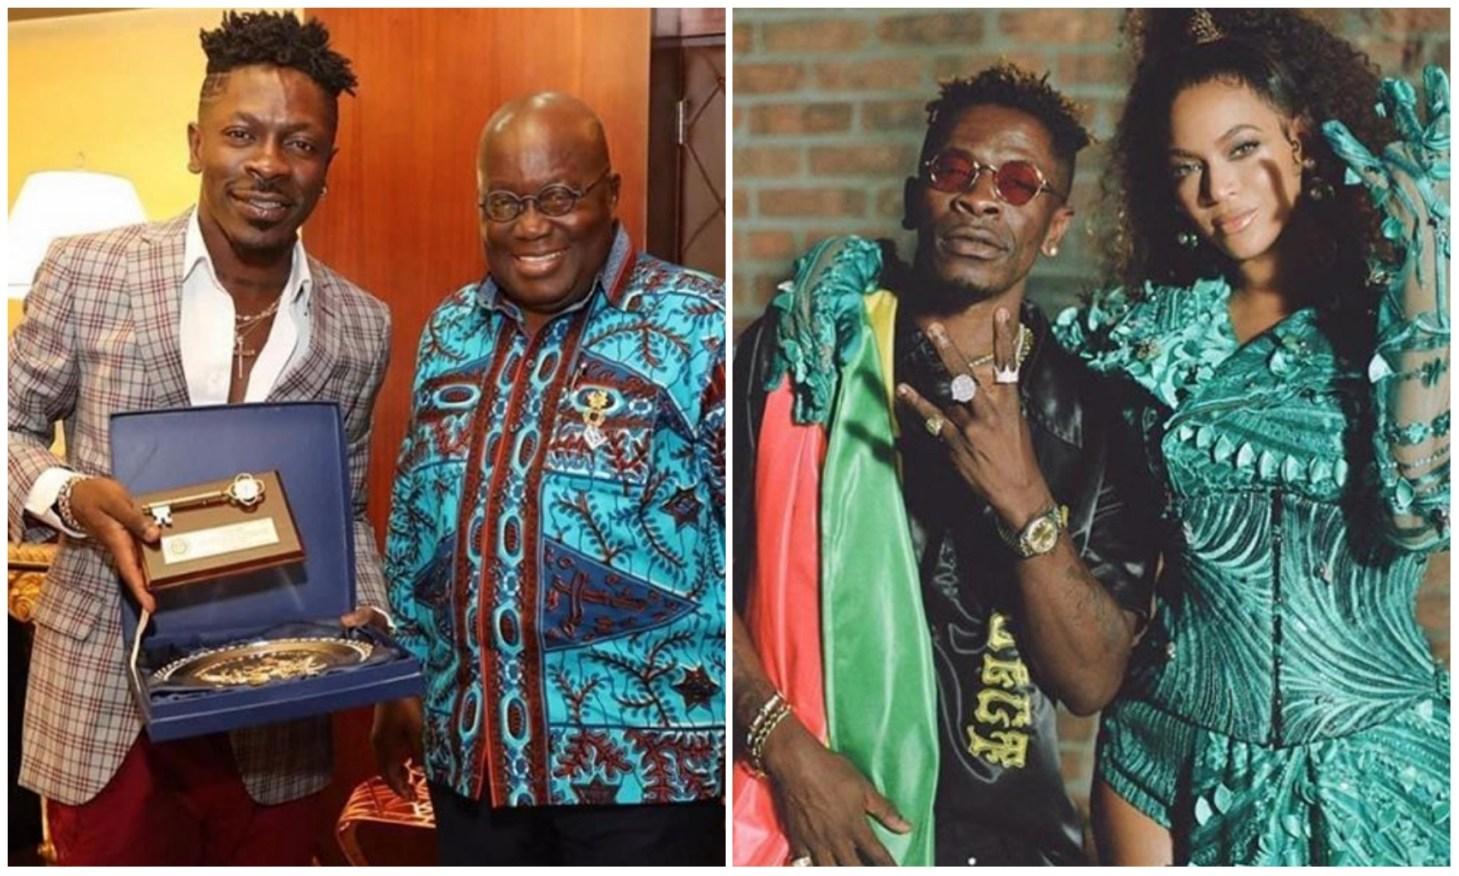 Ghanaian President celebrates Shatta Wale on his collaboration with Beyoncé (Photos)